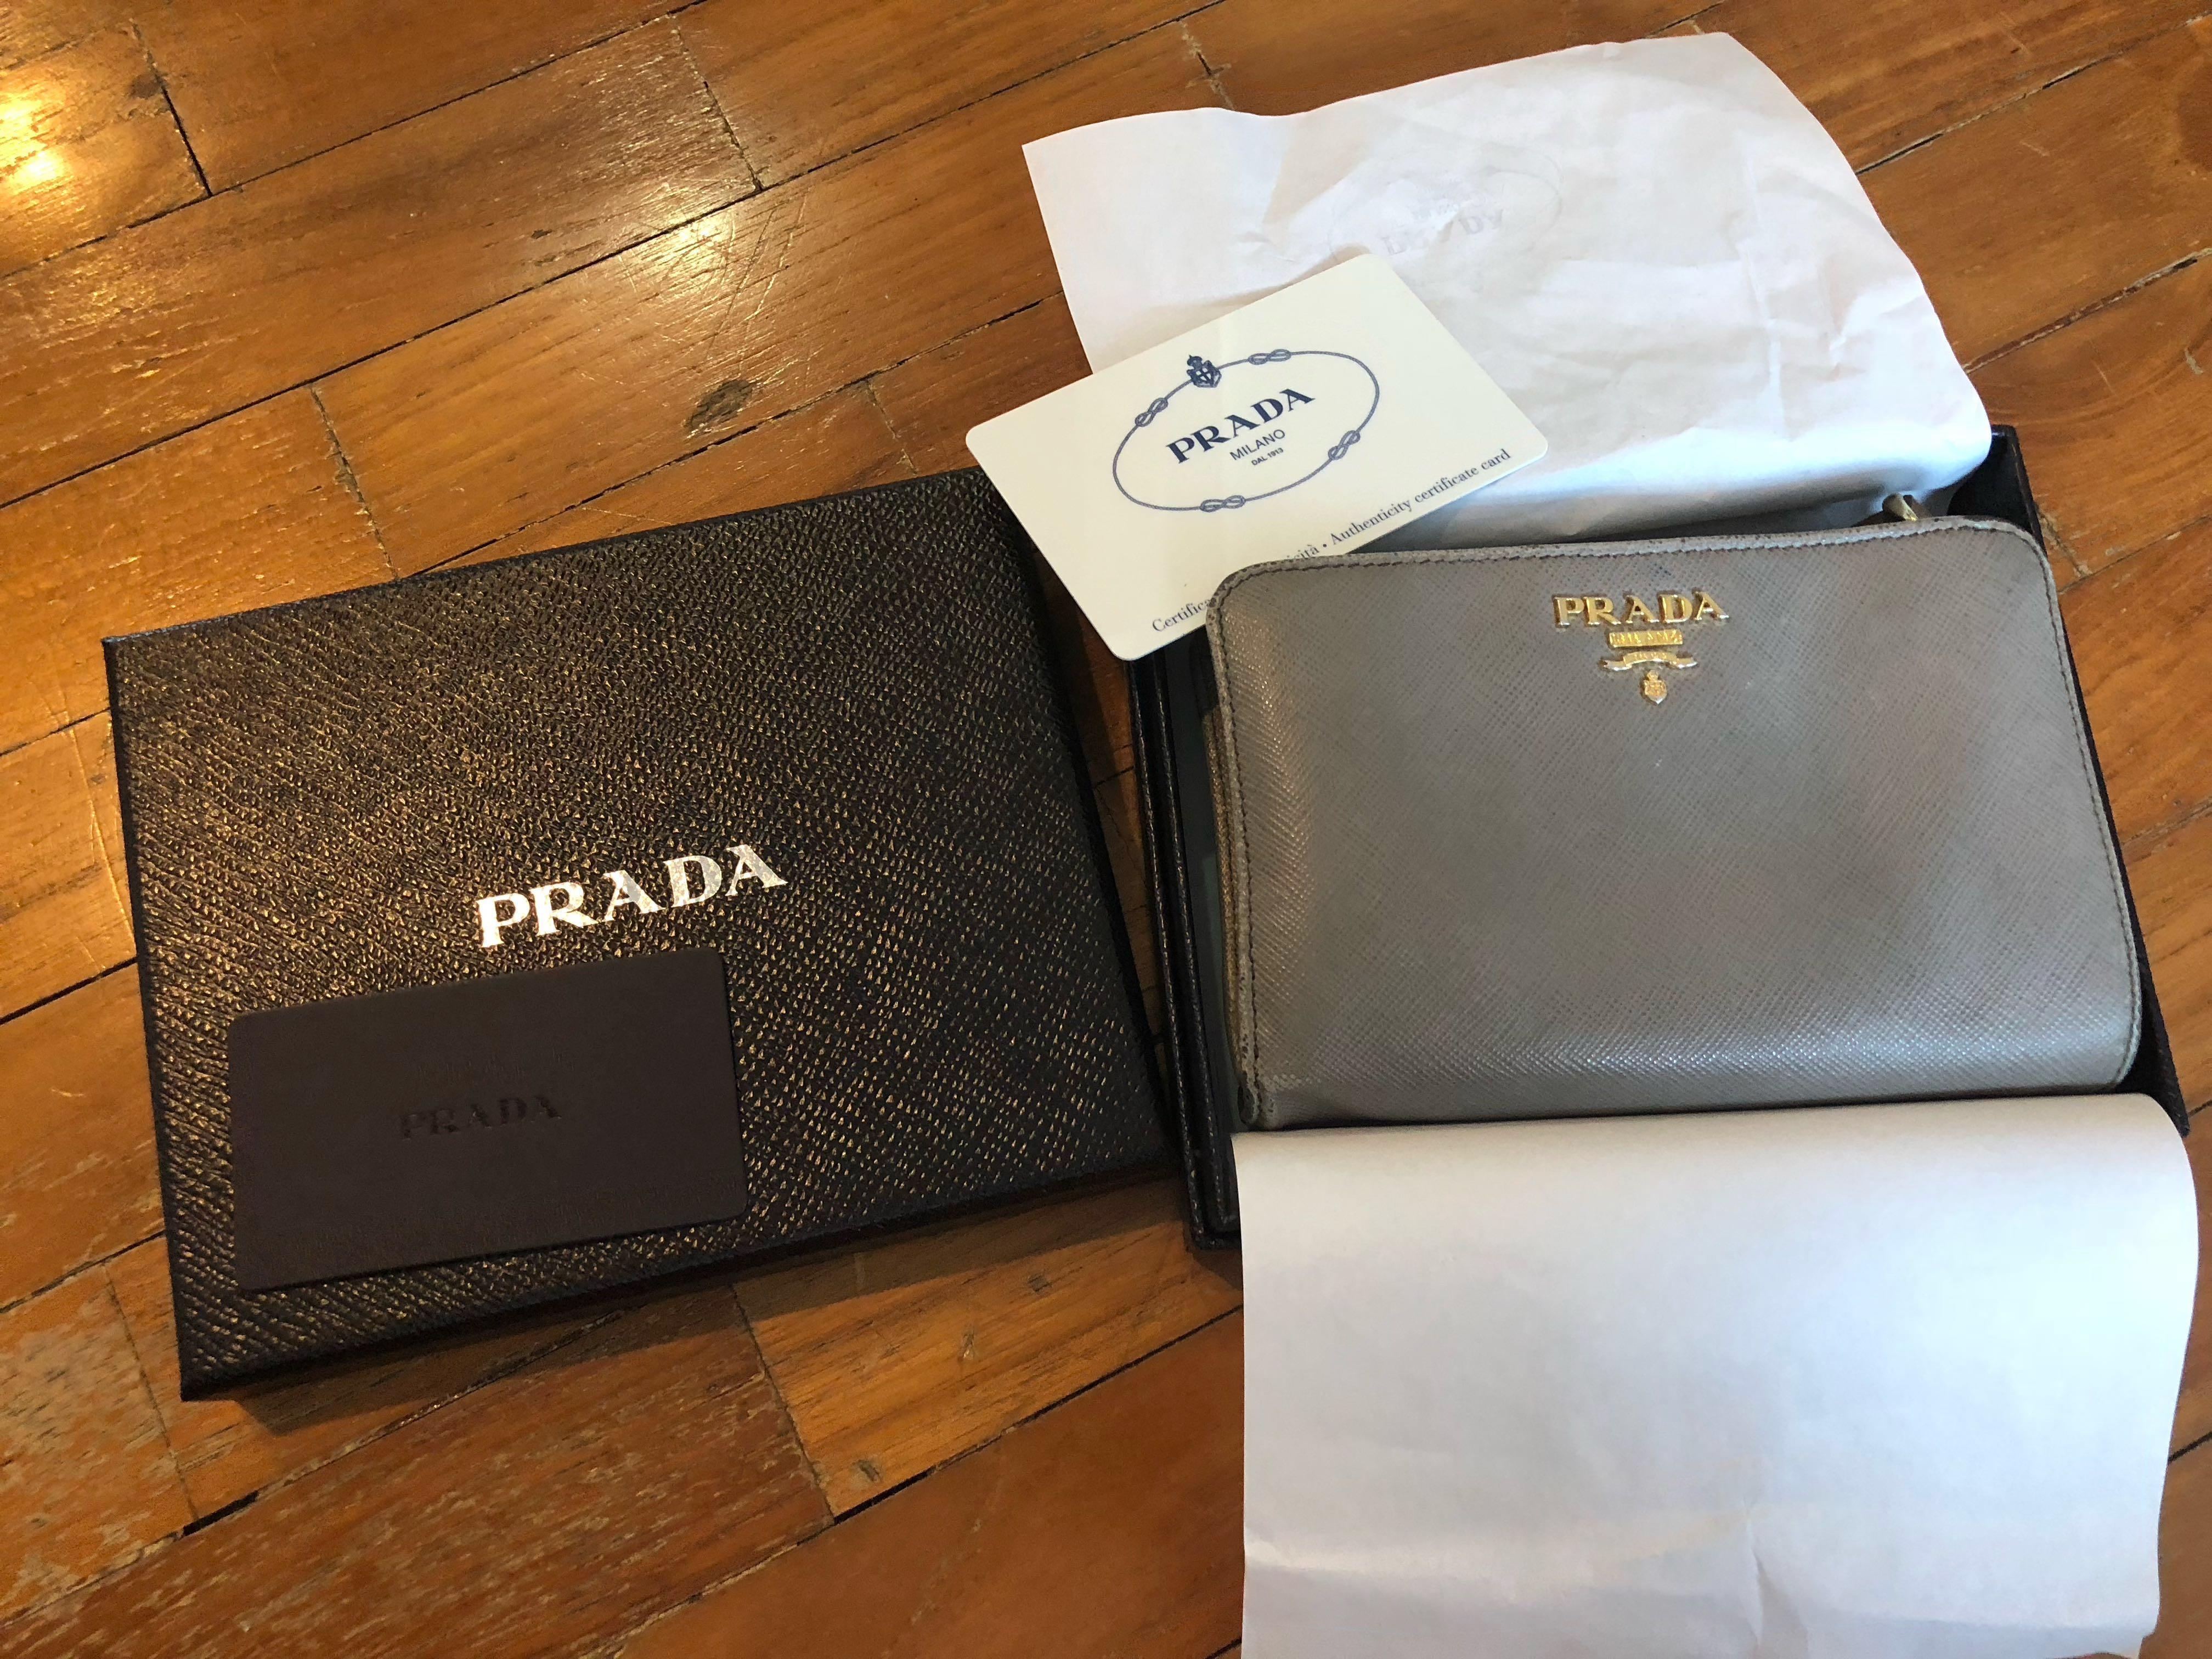 cadcc90f2c8e Prada Saffiano metal Wallet. ( Gucci, Louis Vuitton), Luxury, Bags ...